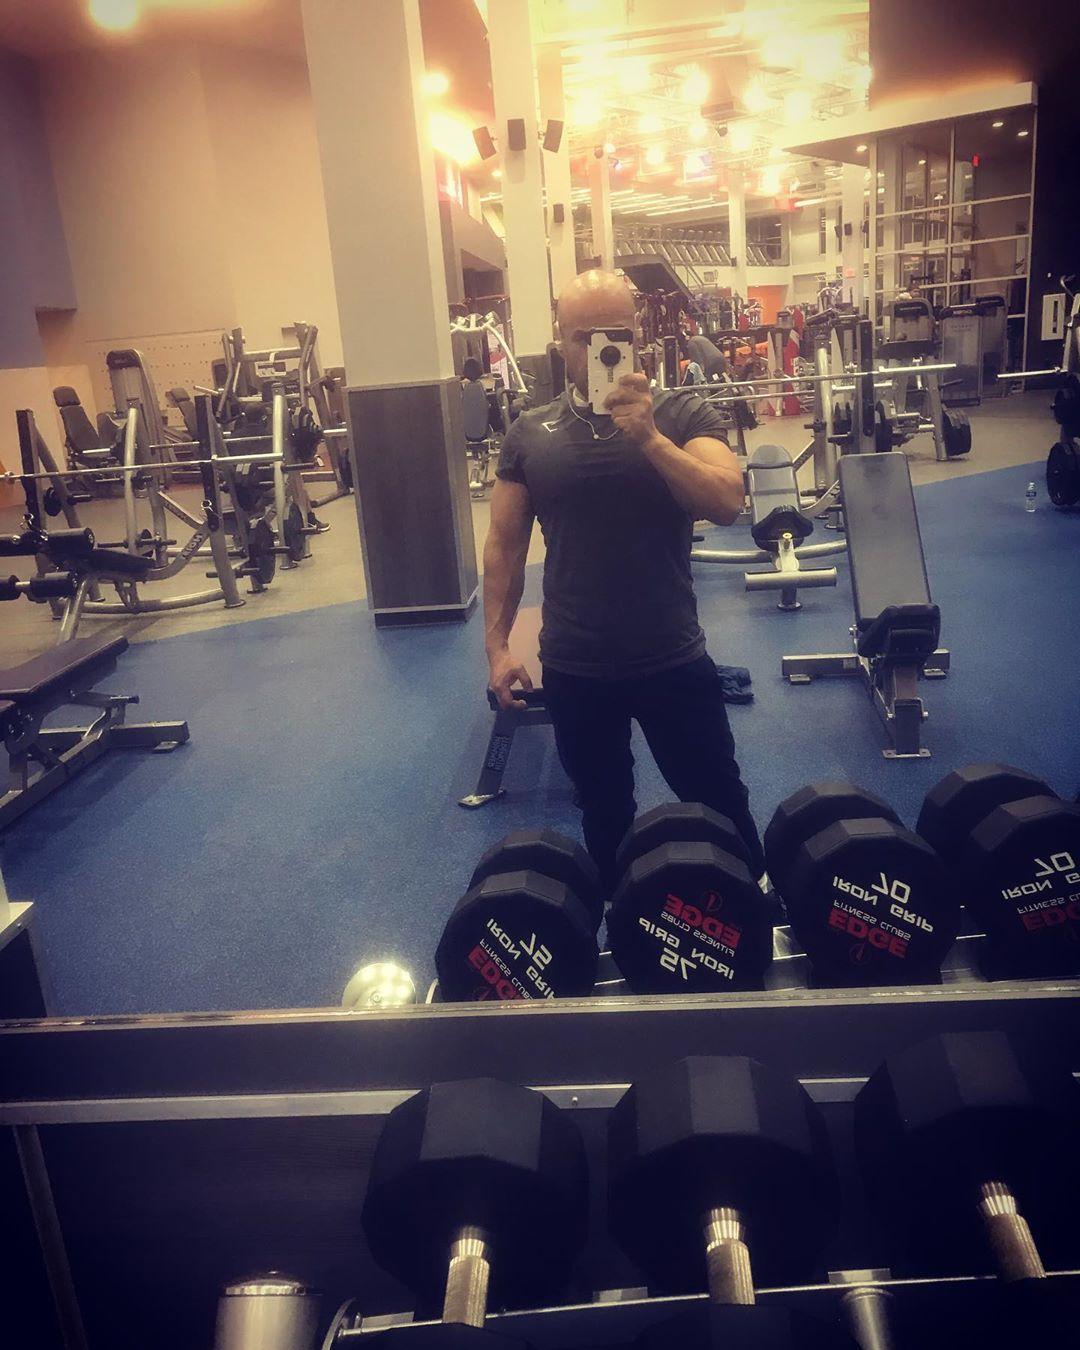 Quick midnight pump 💪🏽 • • • • • #fitness #gym #asthetic #bodybuilder #hard #work #fitness #Edge